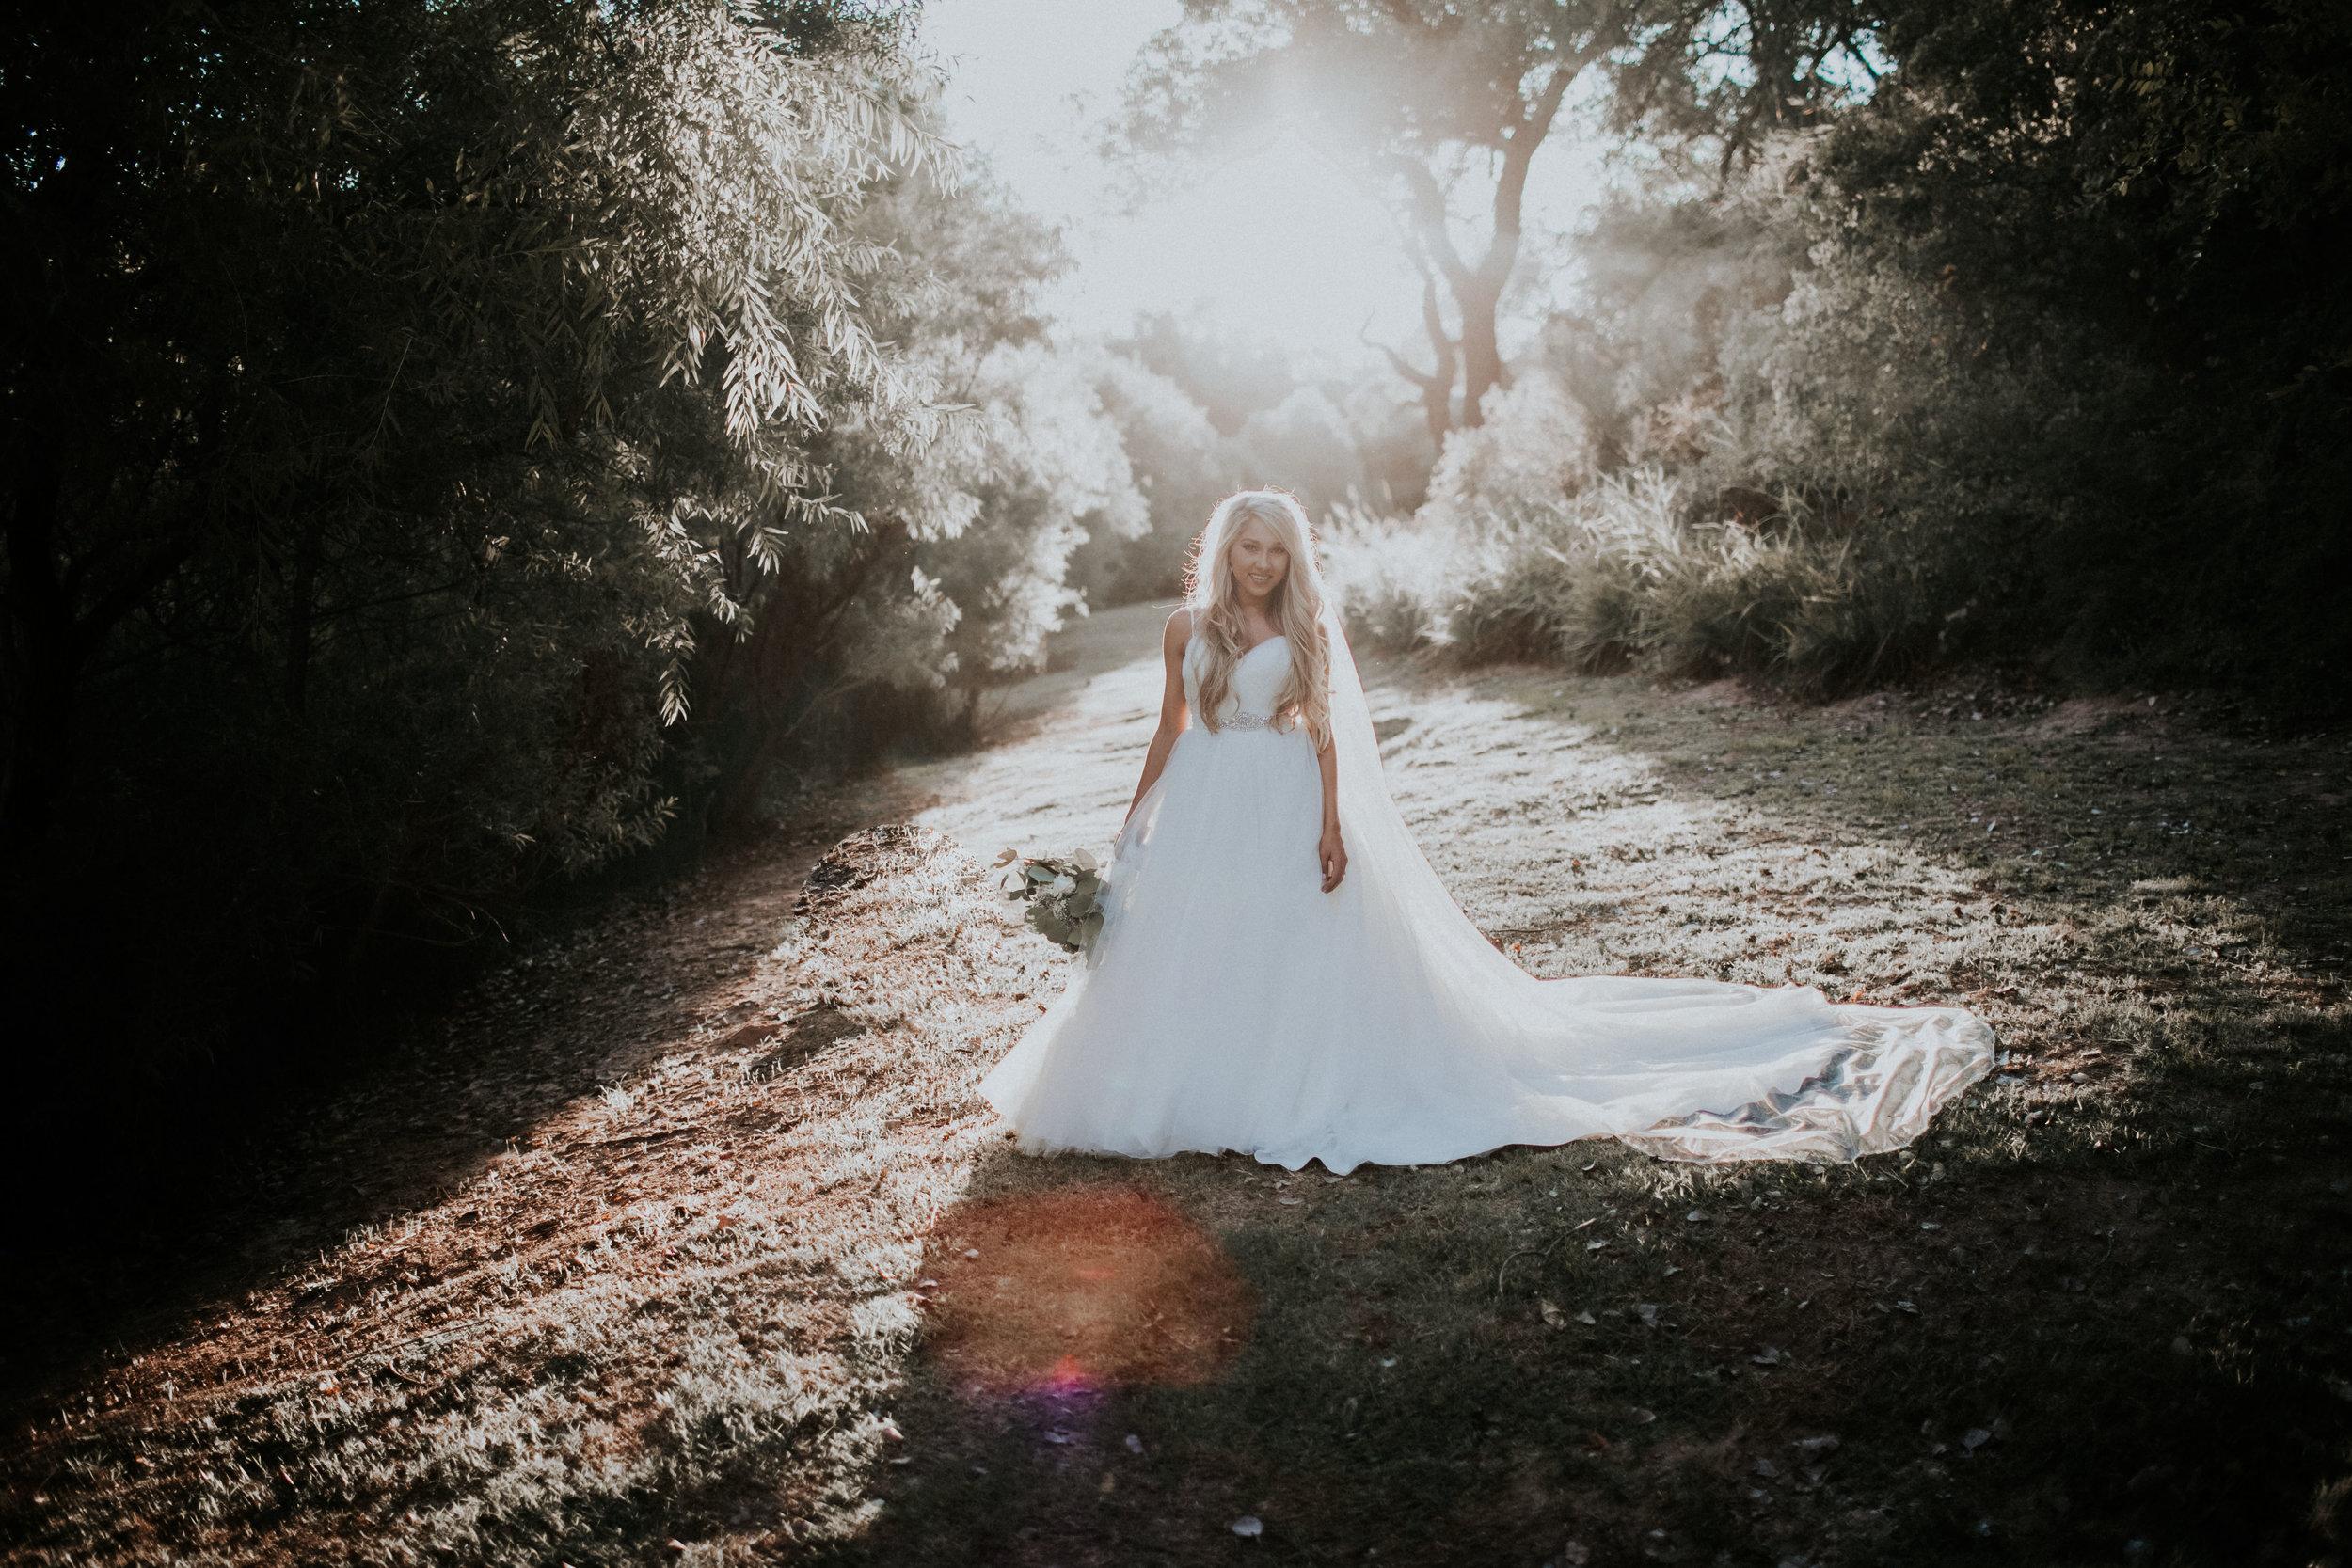 Lubbock Texas Engagment and Wedding Photographer-4288.jpg